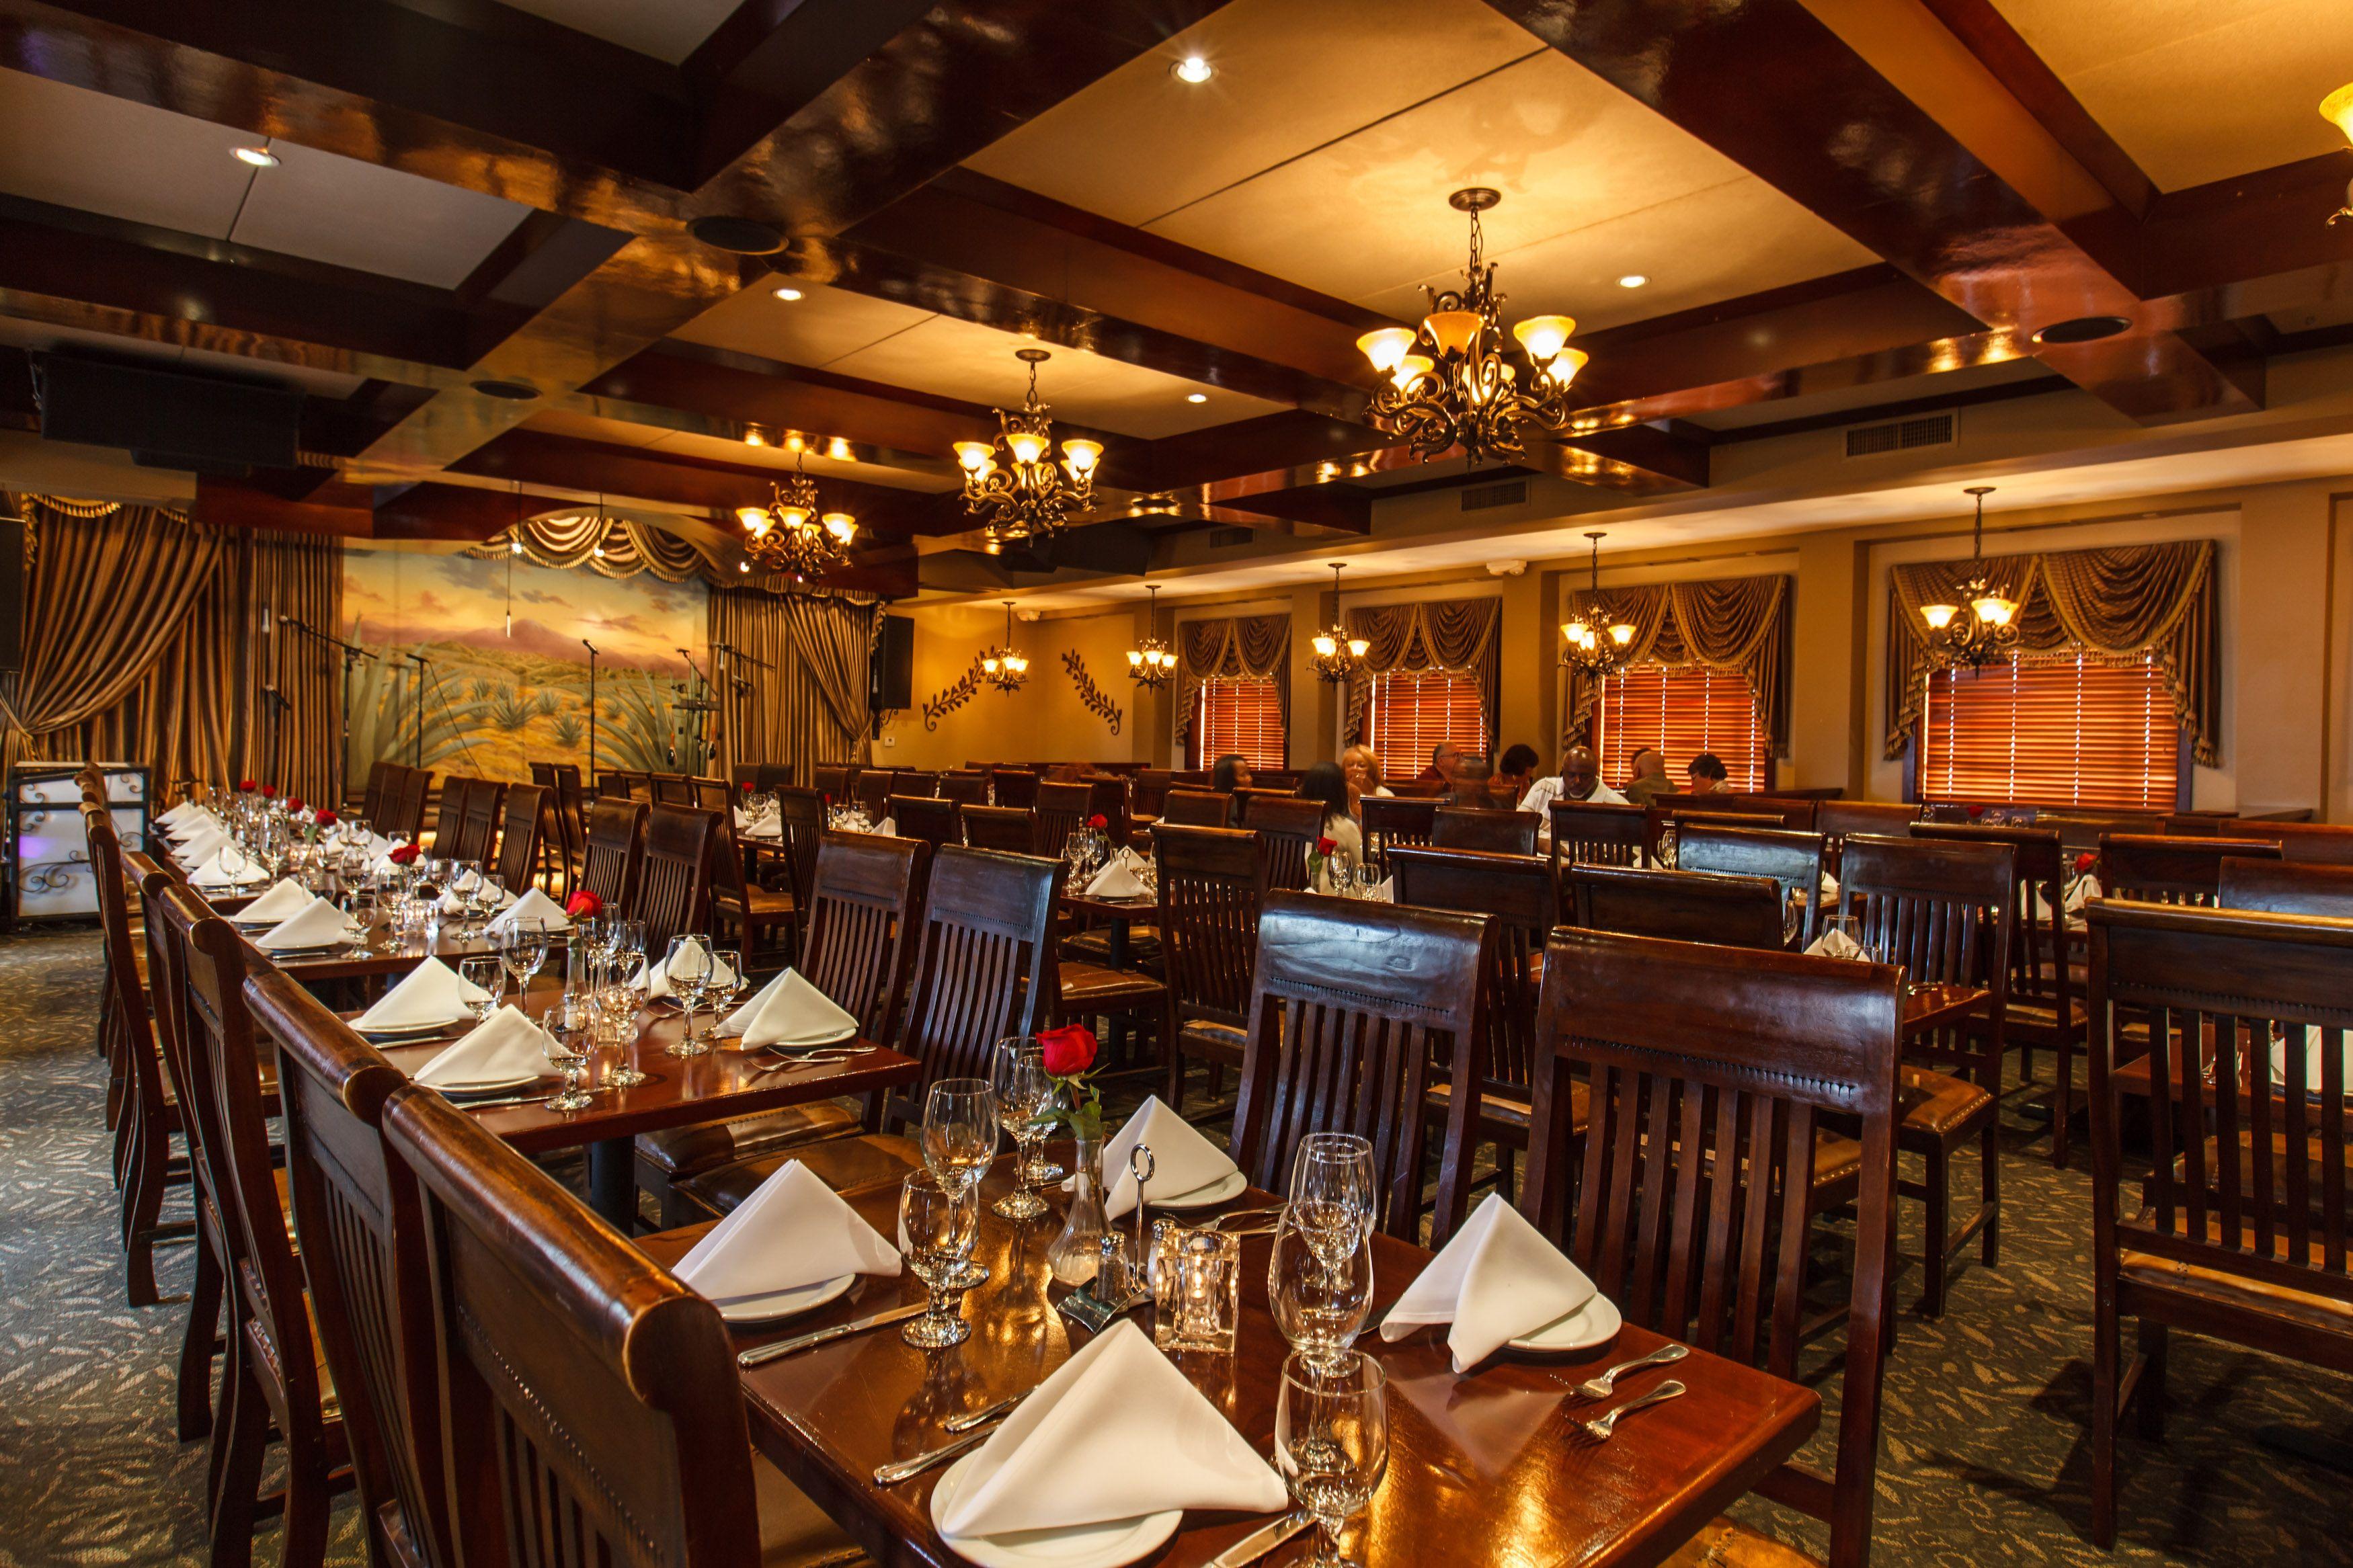 Casa Sanchez Mexican Restaurant 4500 S Centinela Ave Los Angeles Ca 90066 Www Casa Sanchez Com Restaurant Mexican Restaurant Home